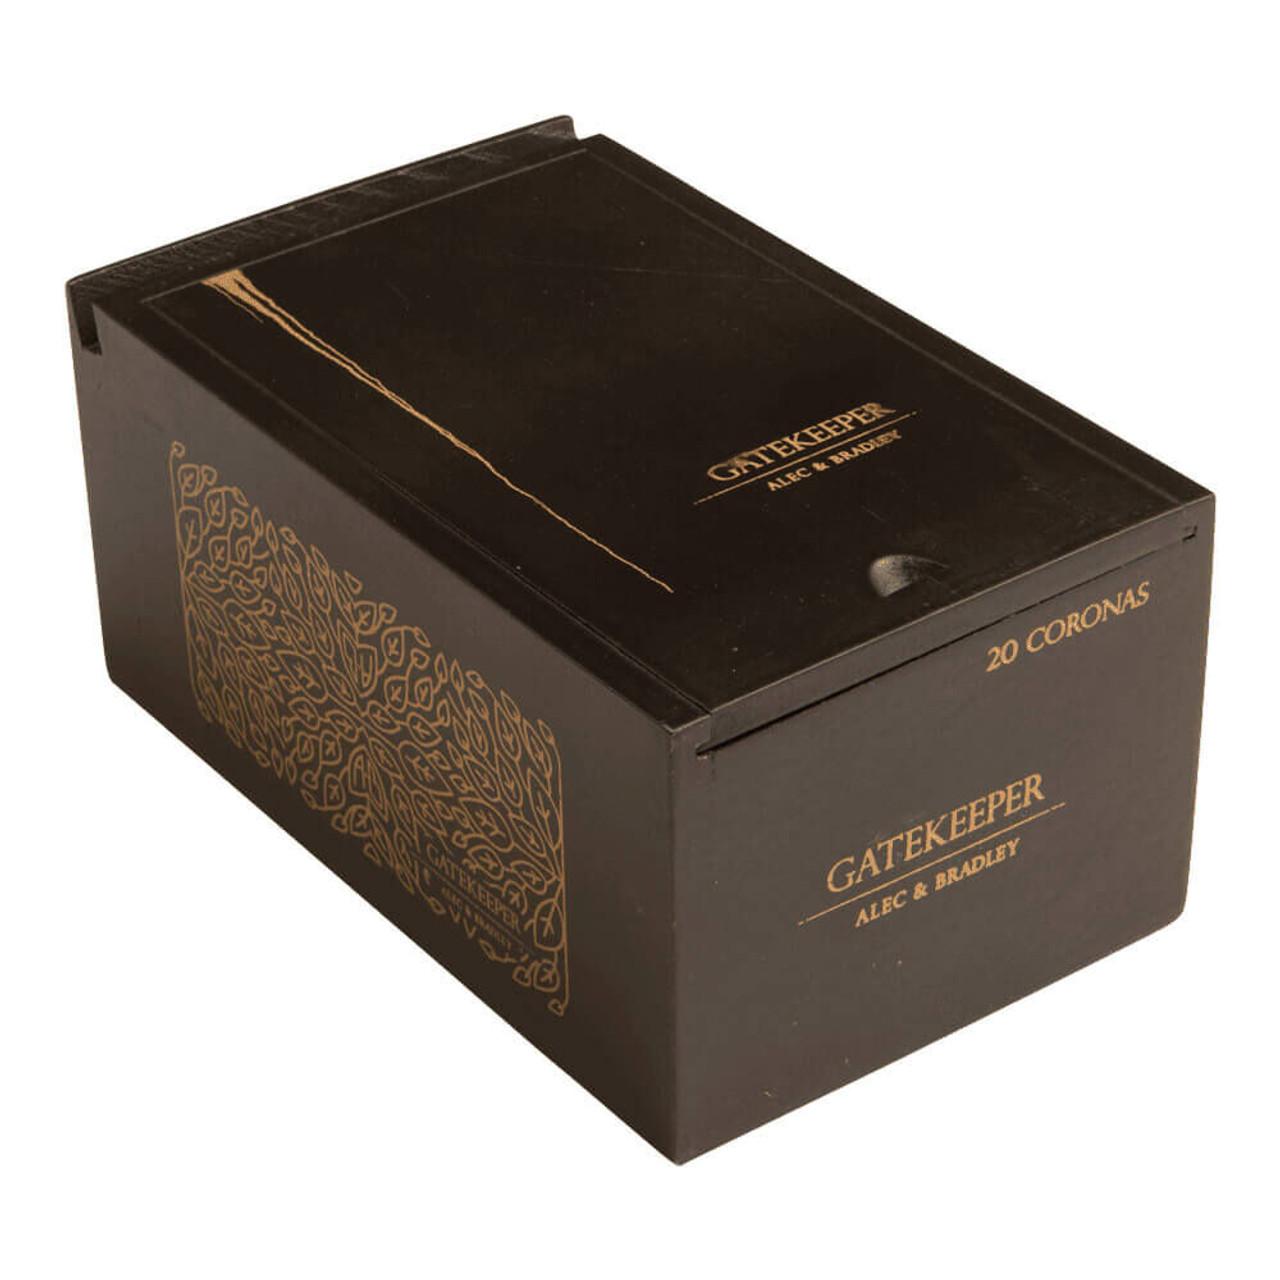 Alec & Bradley Gatekeeper Corona Cigars - 5.12 X 42 (Box of 20)